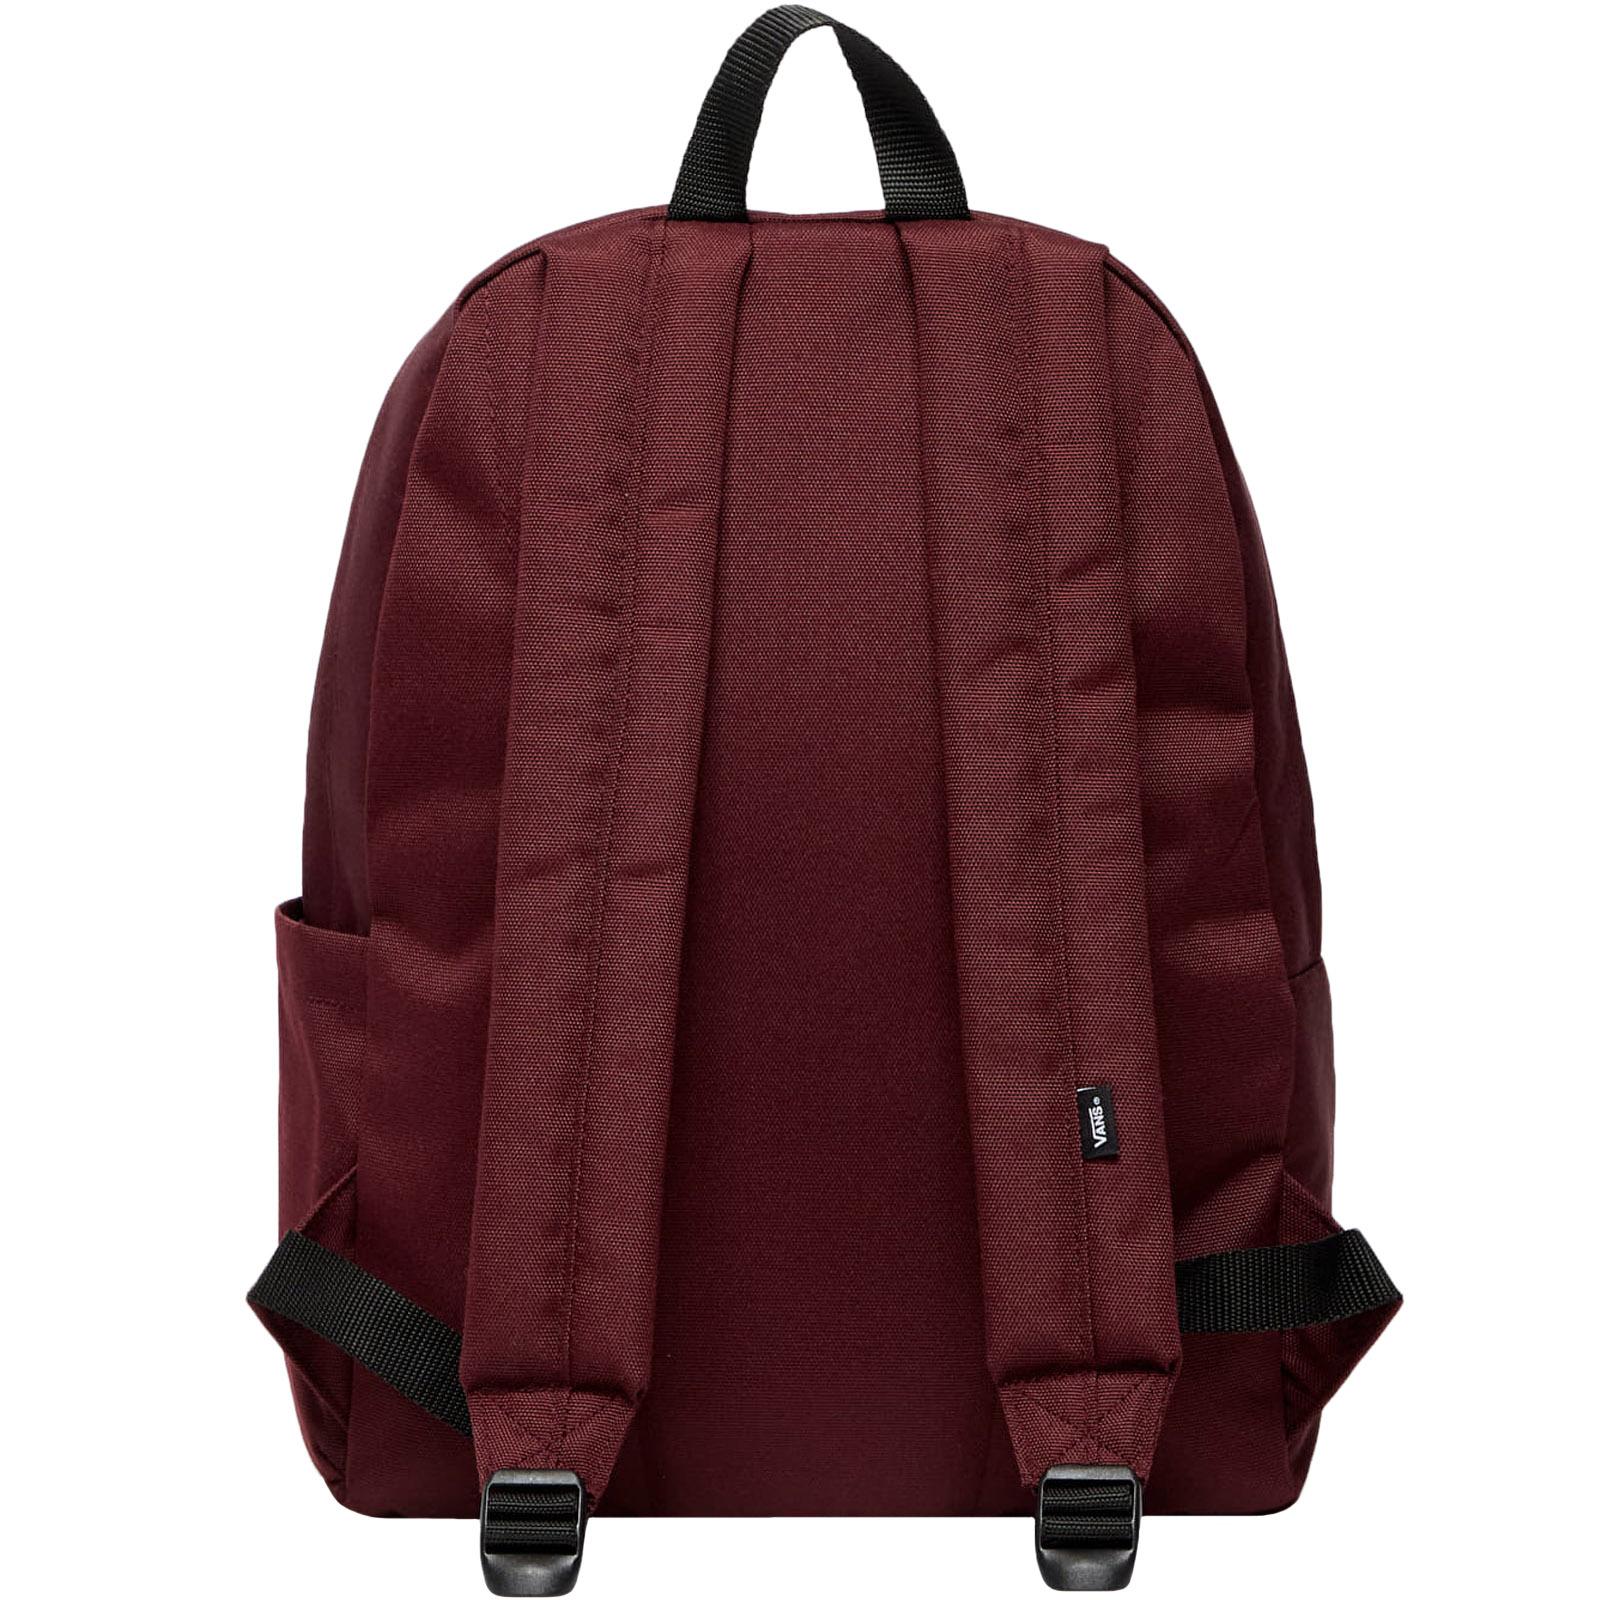 thumbnail 7 - Vans Unisex Old Skool Drop Adjustable Strap School Travel Rucksack Backpack Bag